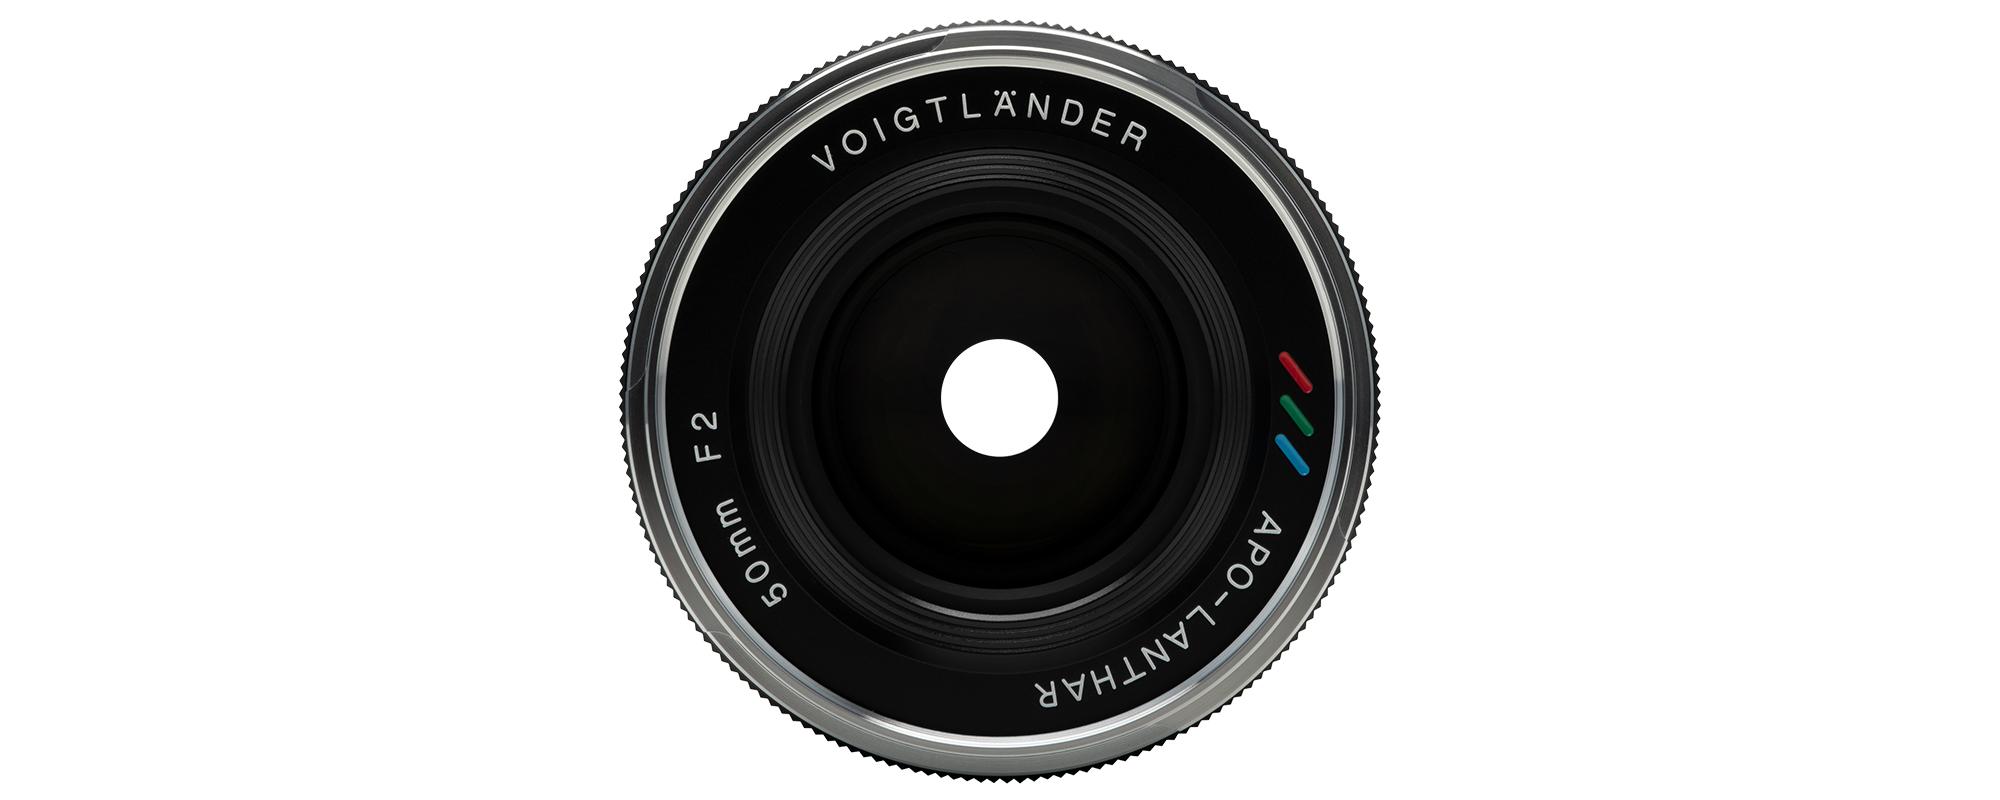 Voigtlander APO Lanthar 50 mm f/2.0 lens for Leica M - 12-blade aperture